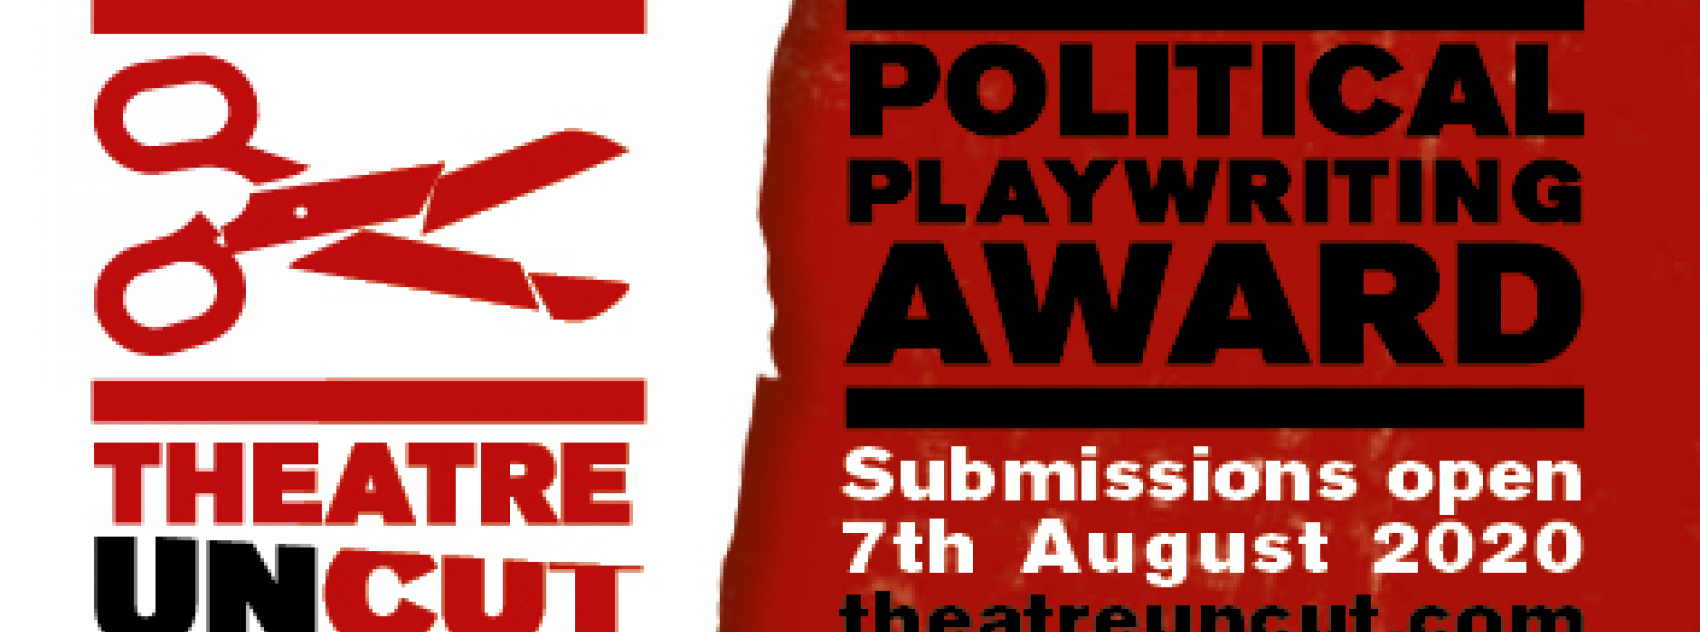 TU POLITICAL PLAY AWARD 2020 FB newsfeed or event image2